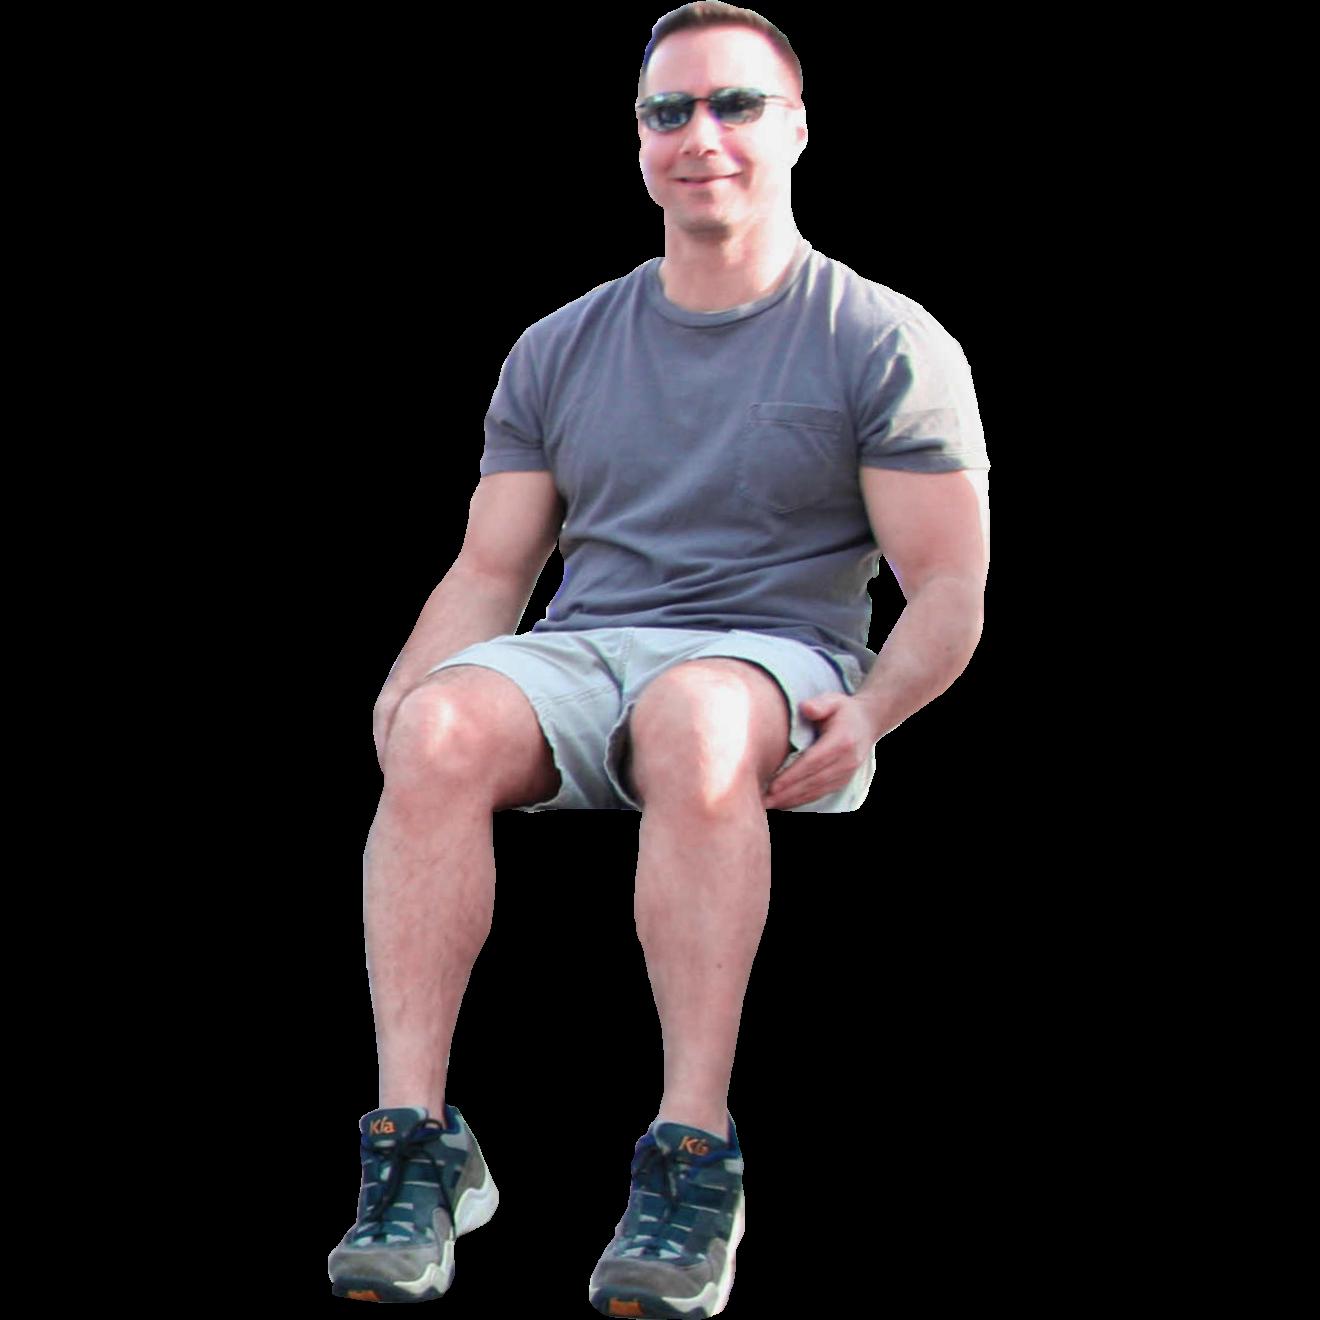 Download Sitting Man Image HQ PNG Image   FreePNGImg for People Sitting Png  45gtk